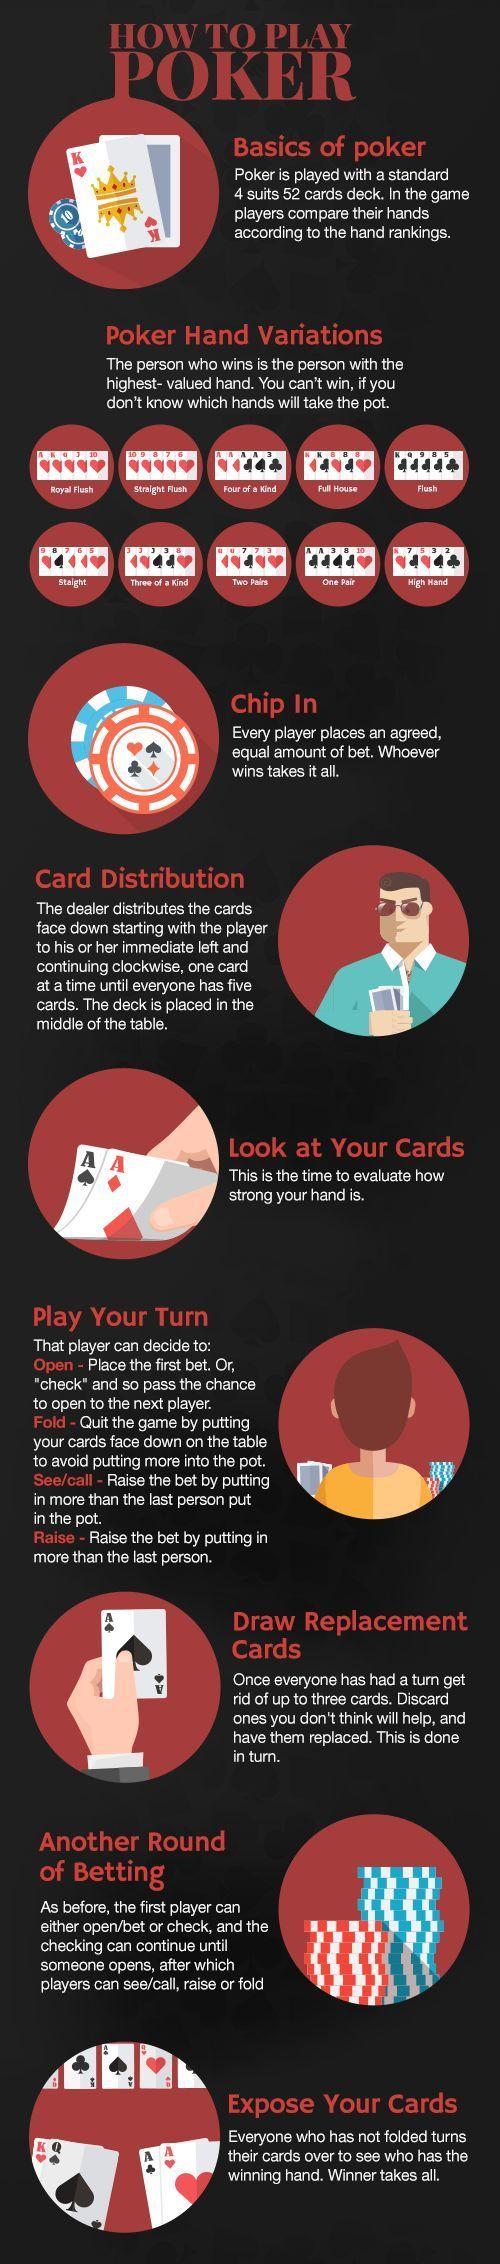 gambling ethics issues